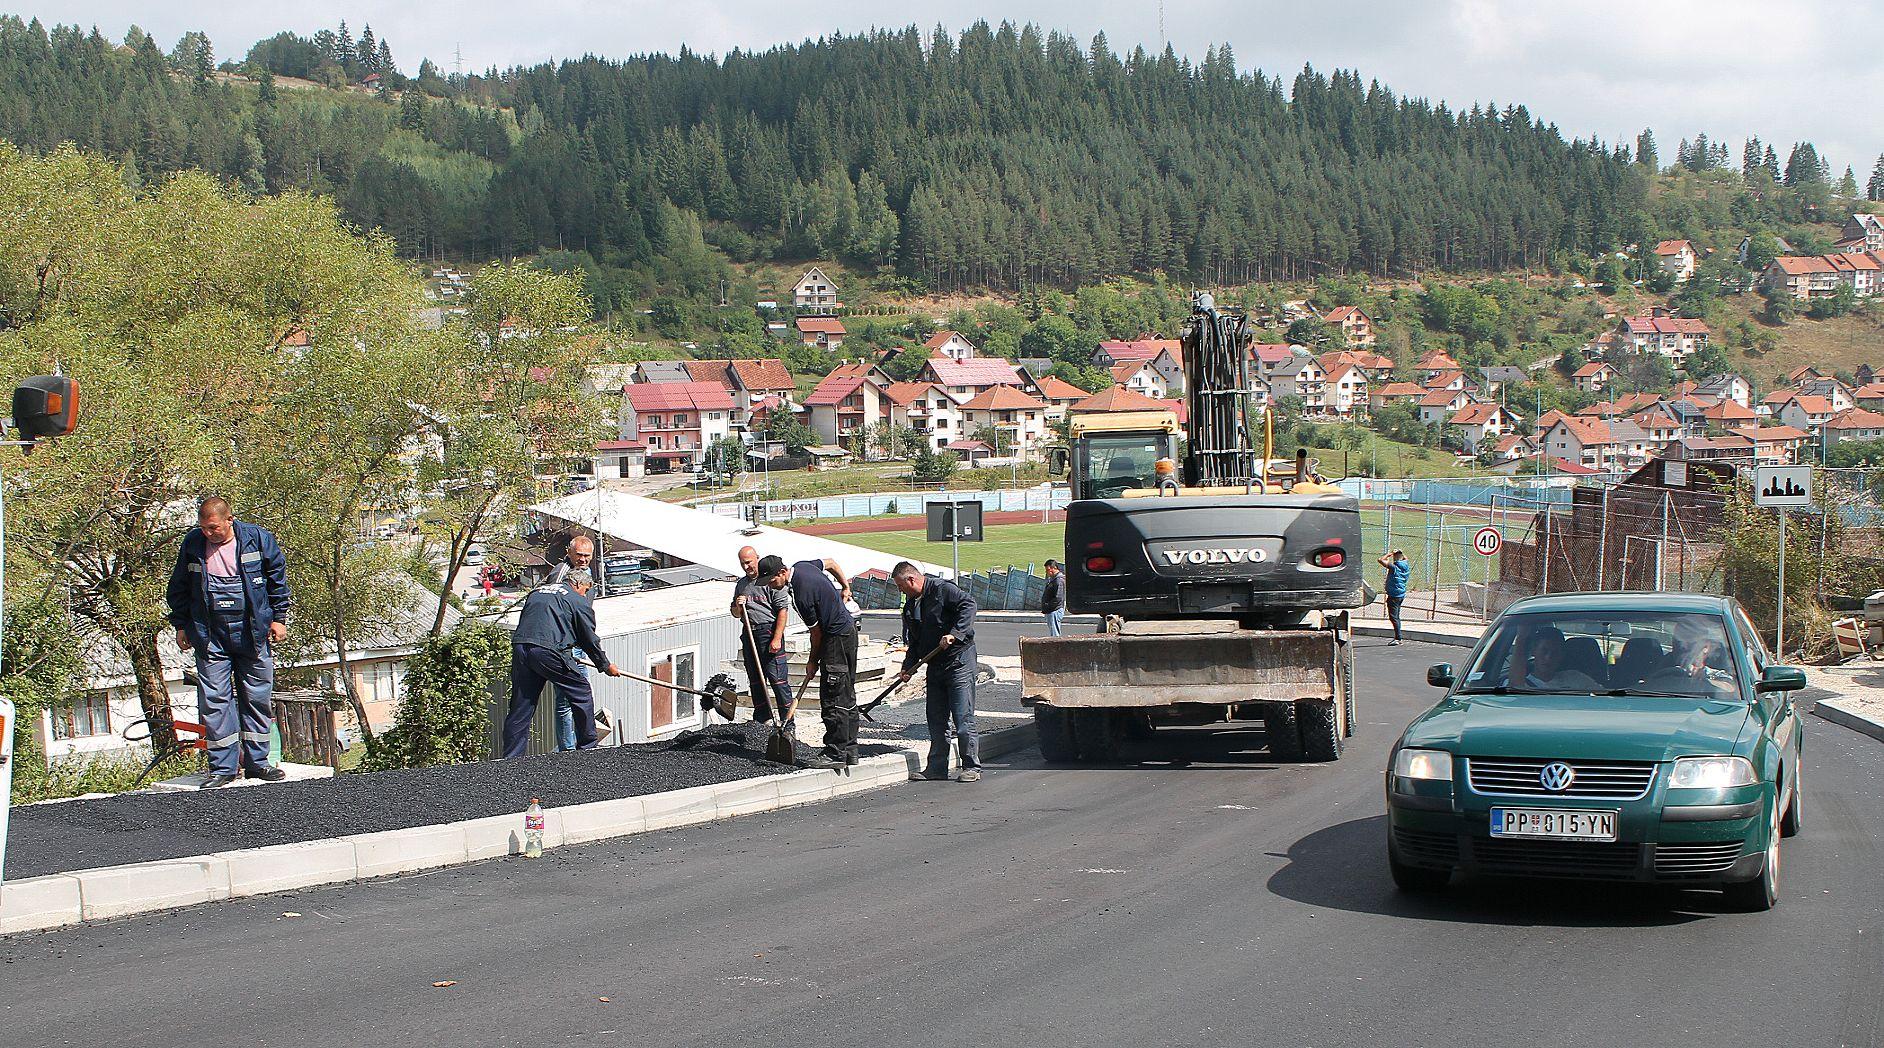 Финиш - последњи метри асфалта код стадиона